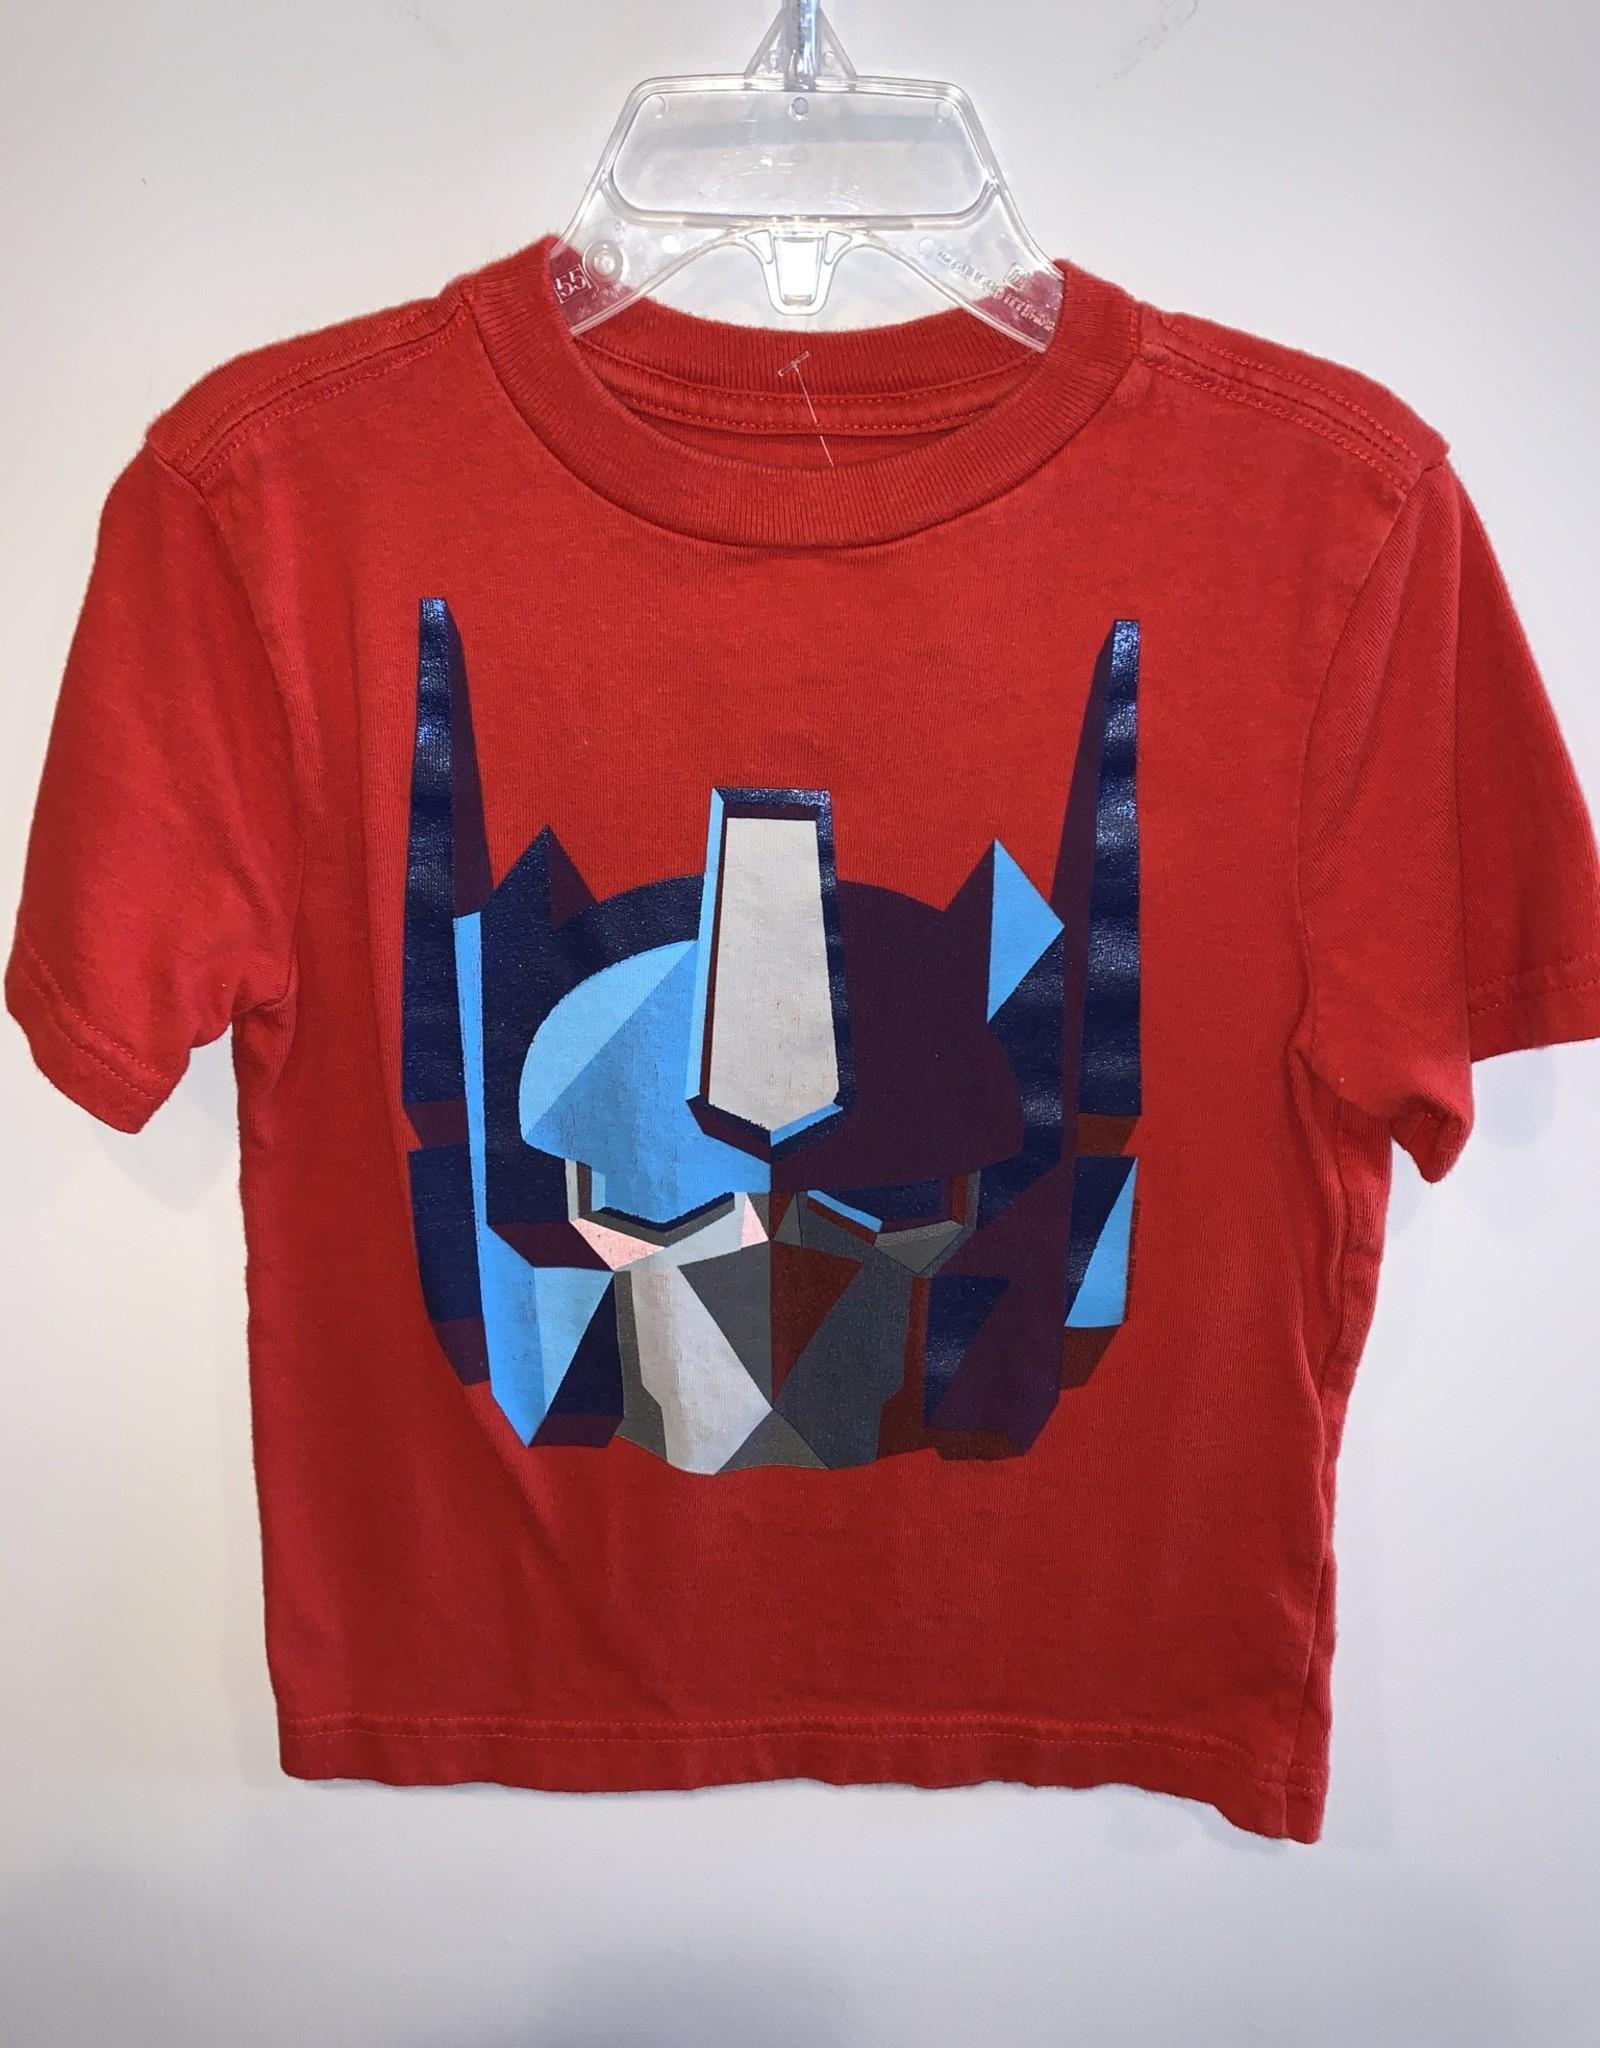 Gymboree Boys/3T/Gymboree/Shirt